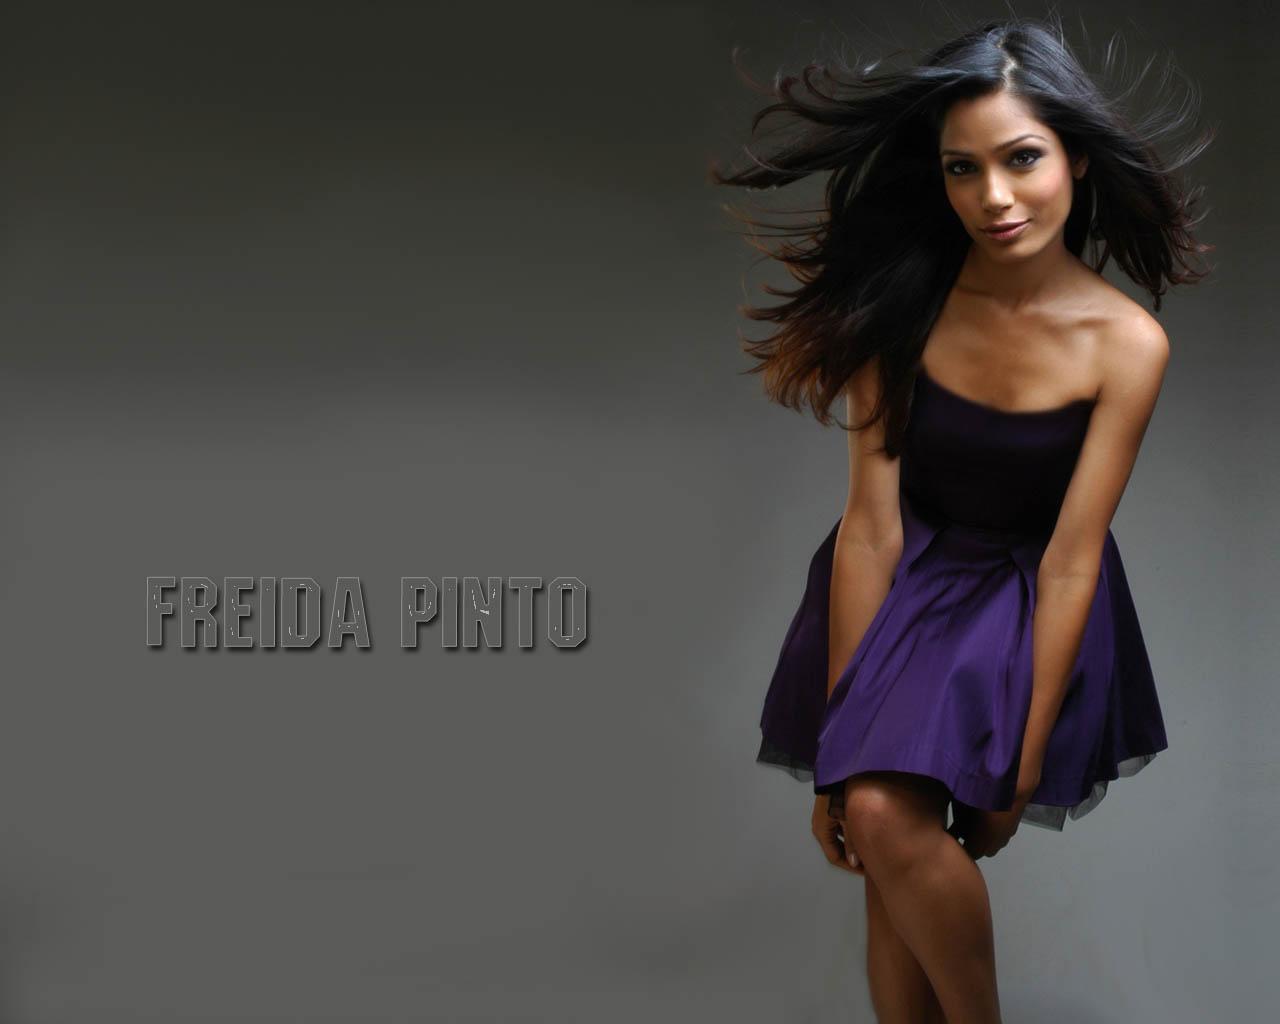 http://3.bp.blogspot.com/_IT5iqKJc-og/THu8Y1ly-7I/AAAAAAAABuk/0okqay_29Js/s1600/Freida_Pinto4.jpg